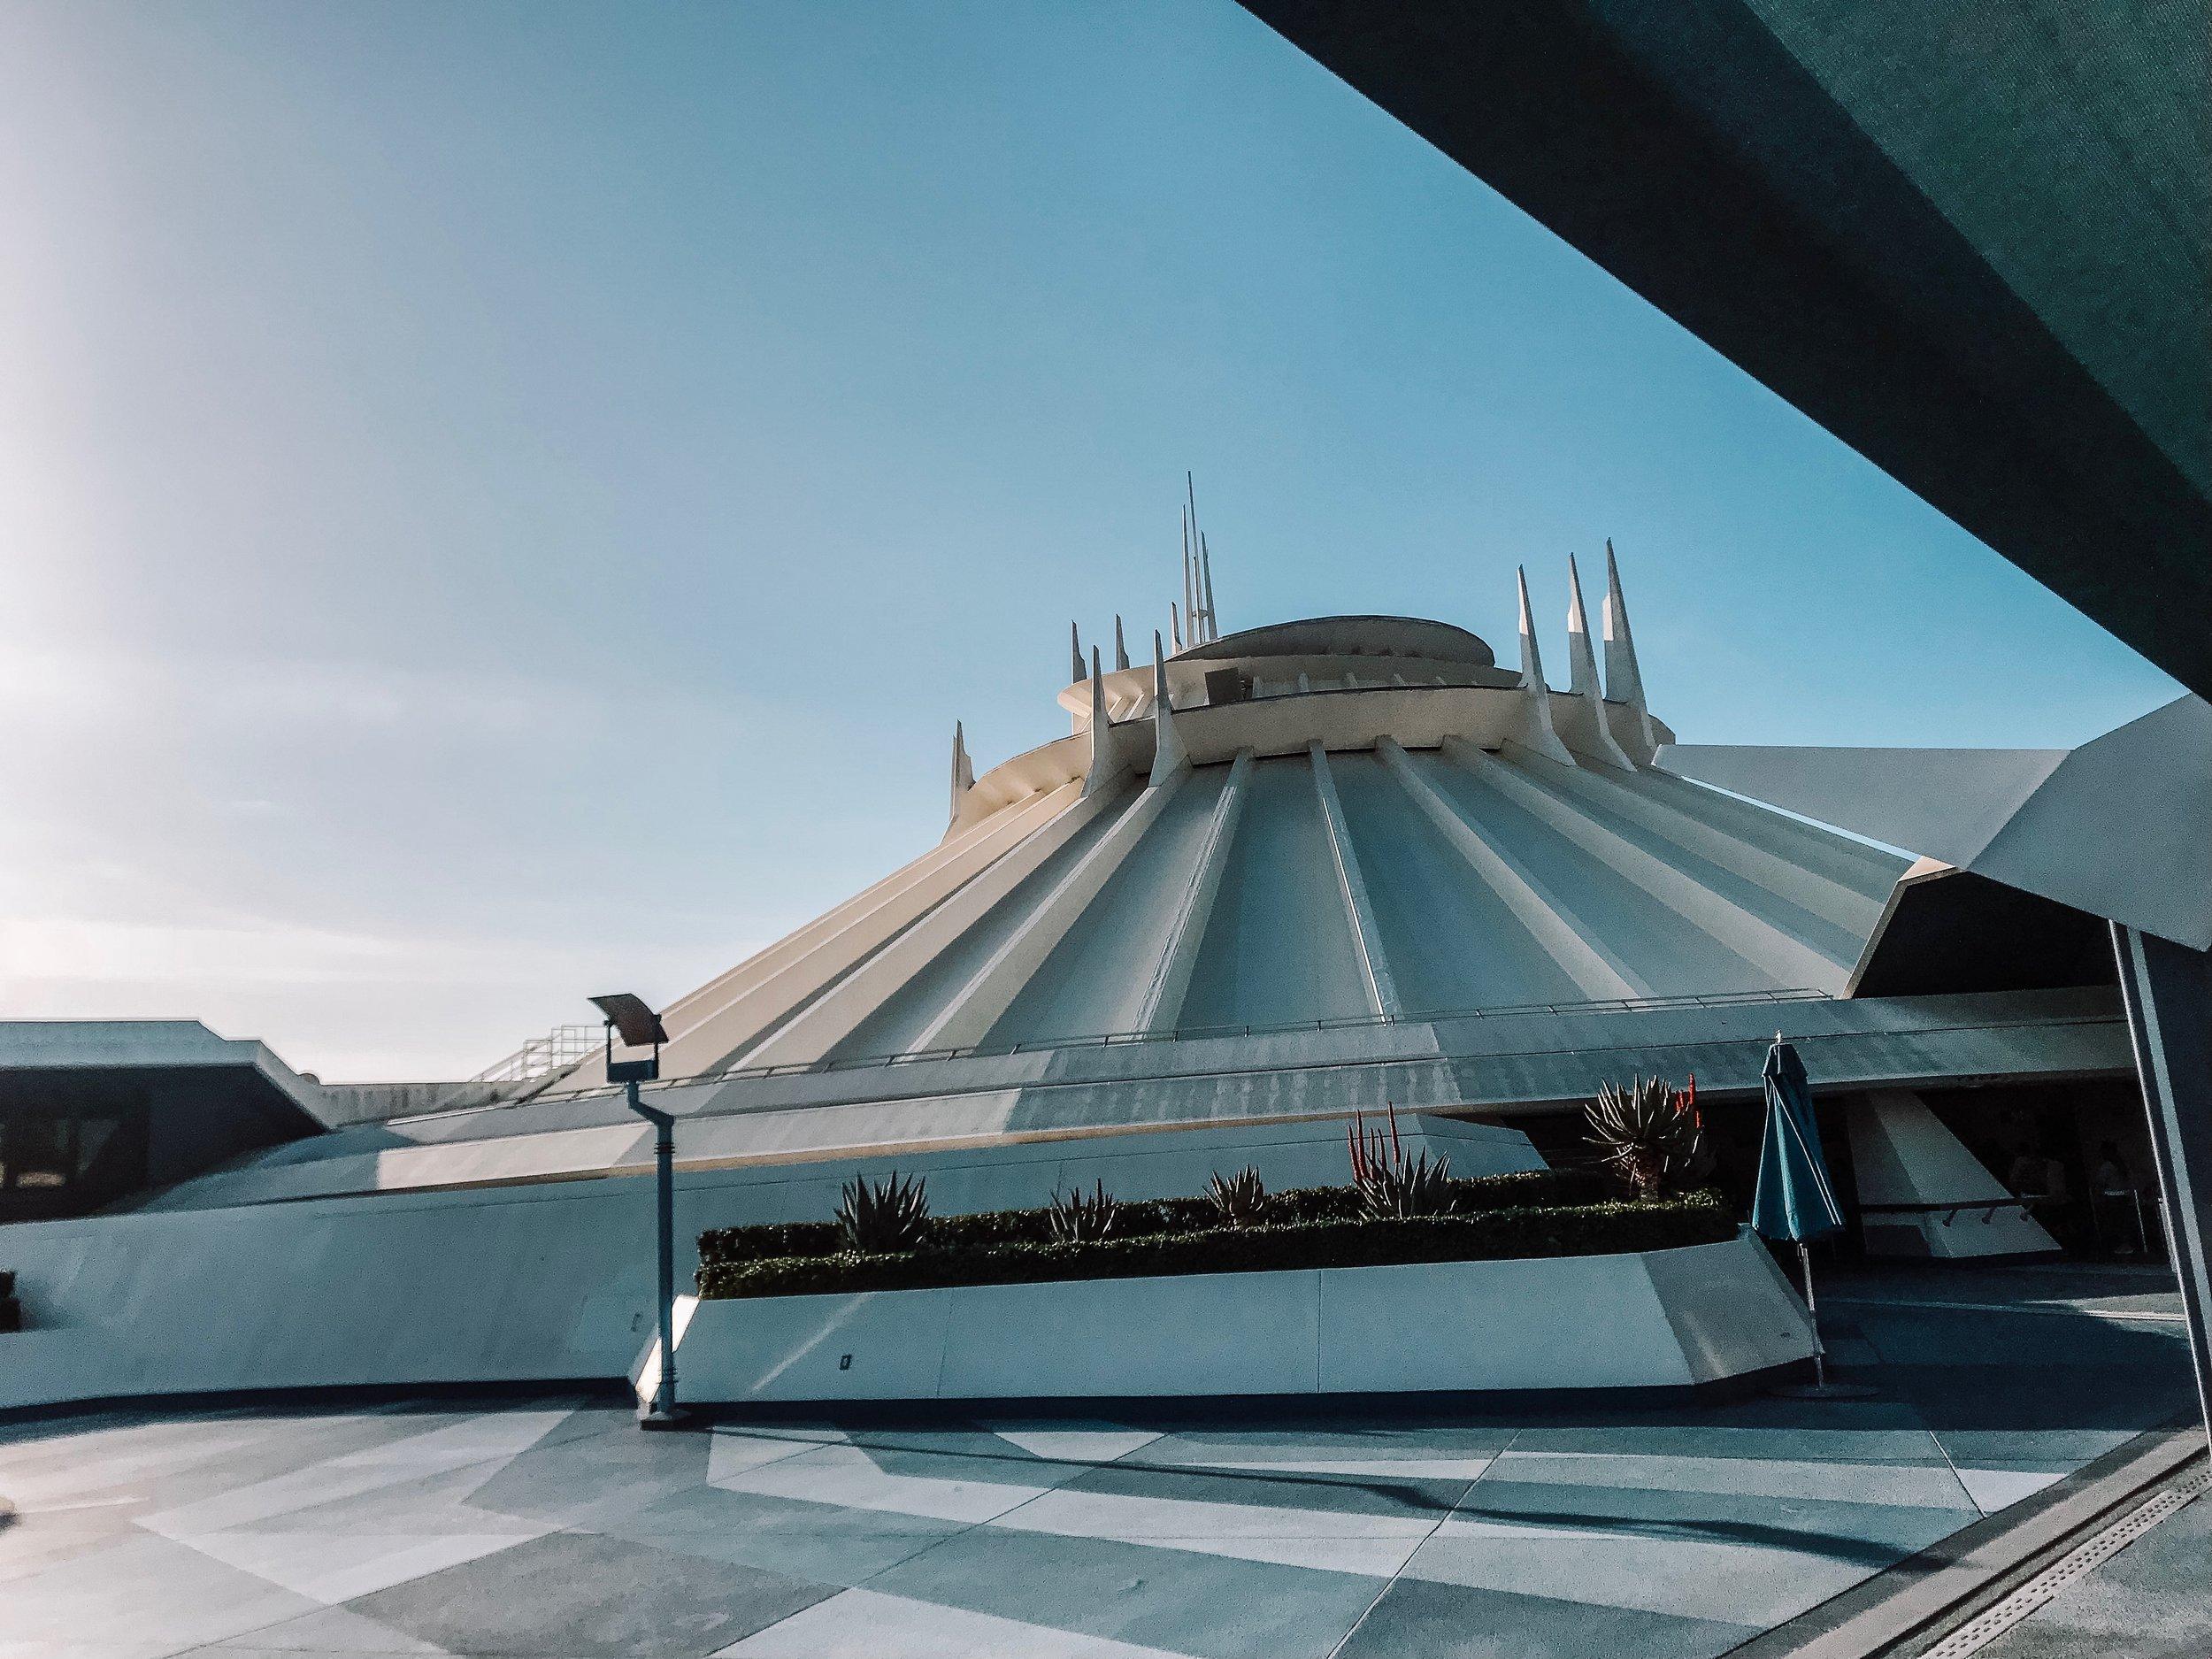 Space Mountain Disneyland.jpg